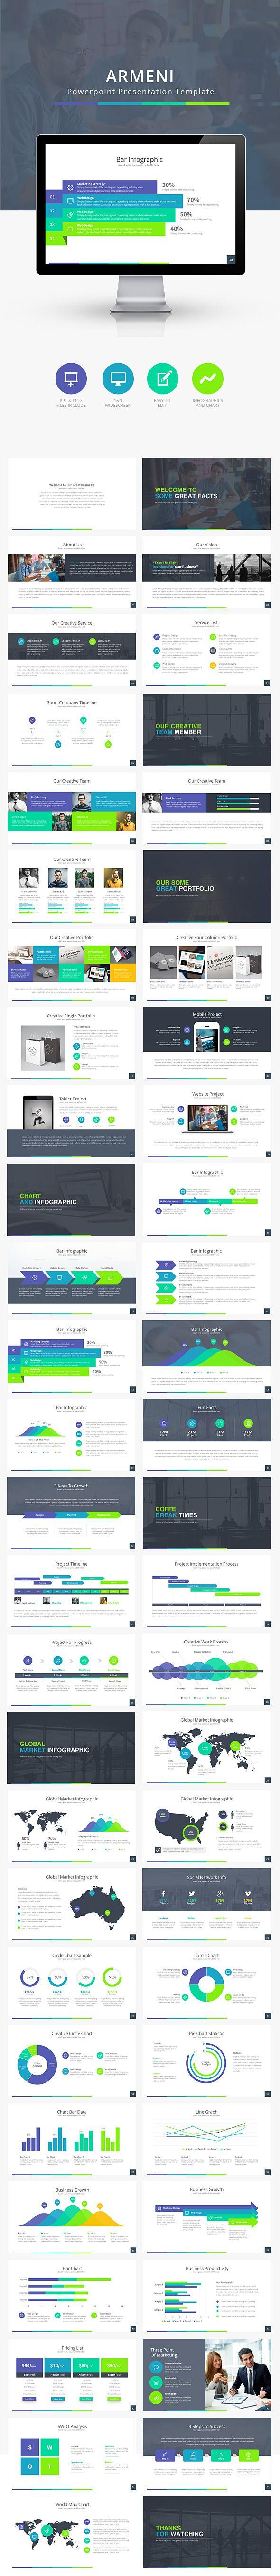 Armeni Powerpoint Presentation Template  (Powerpoint Templates)